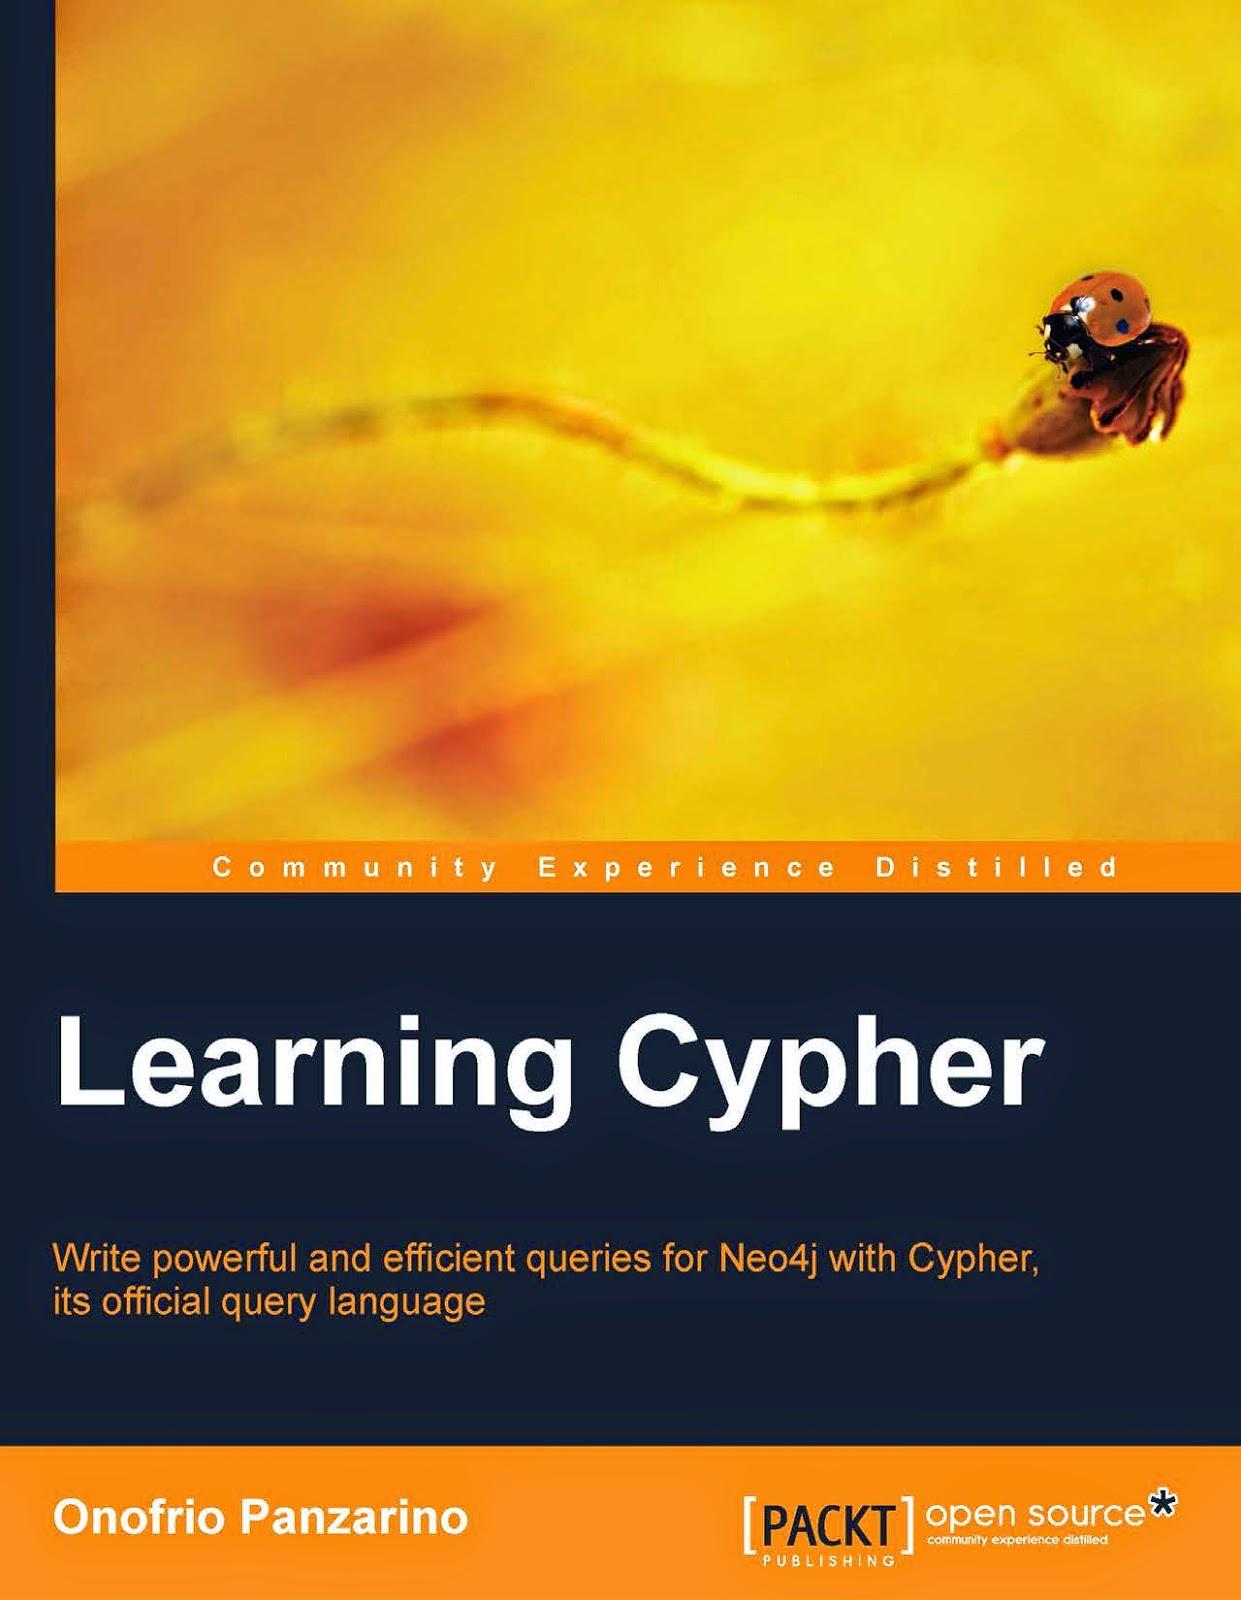 http://kingcheapebook.blogspot.com/2014/07/learning-cypher.html